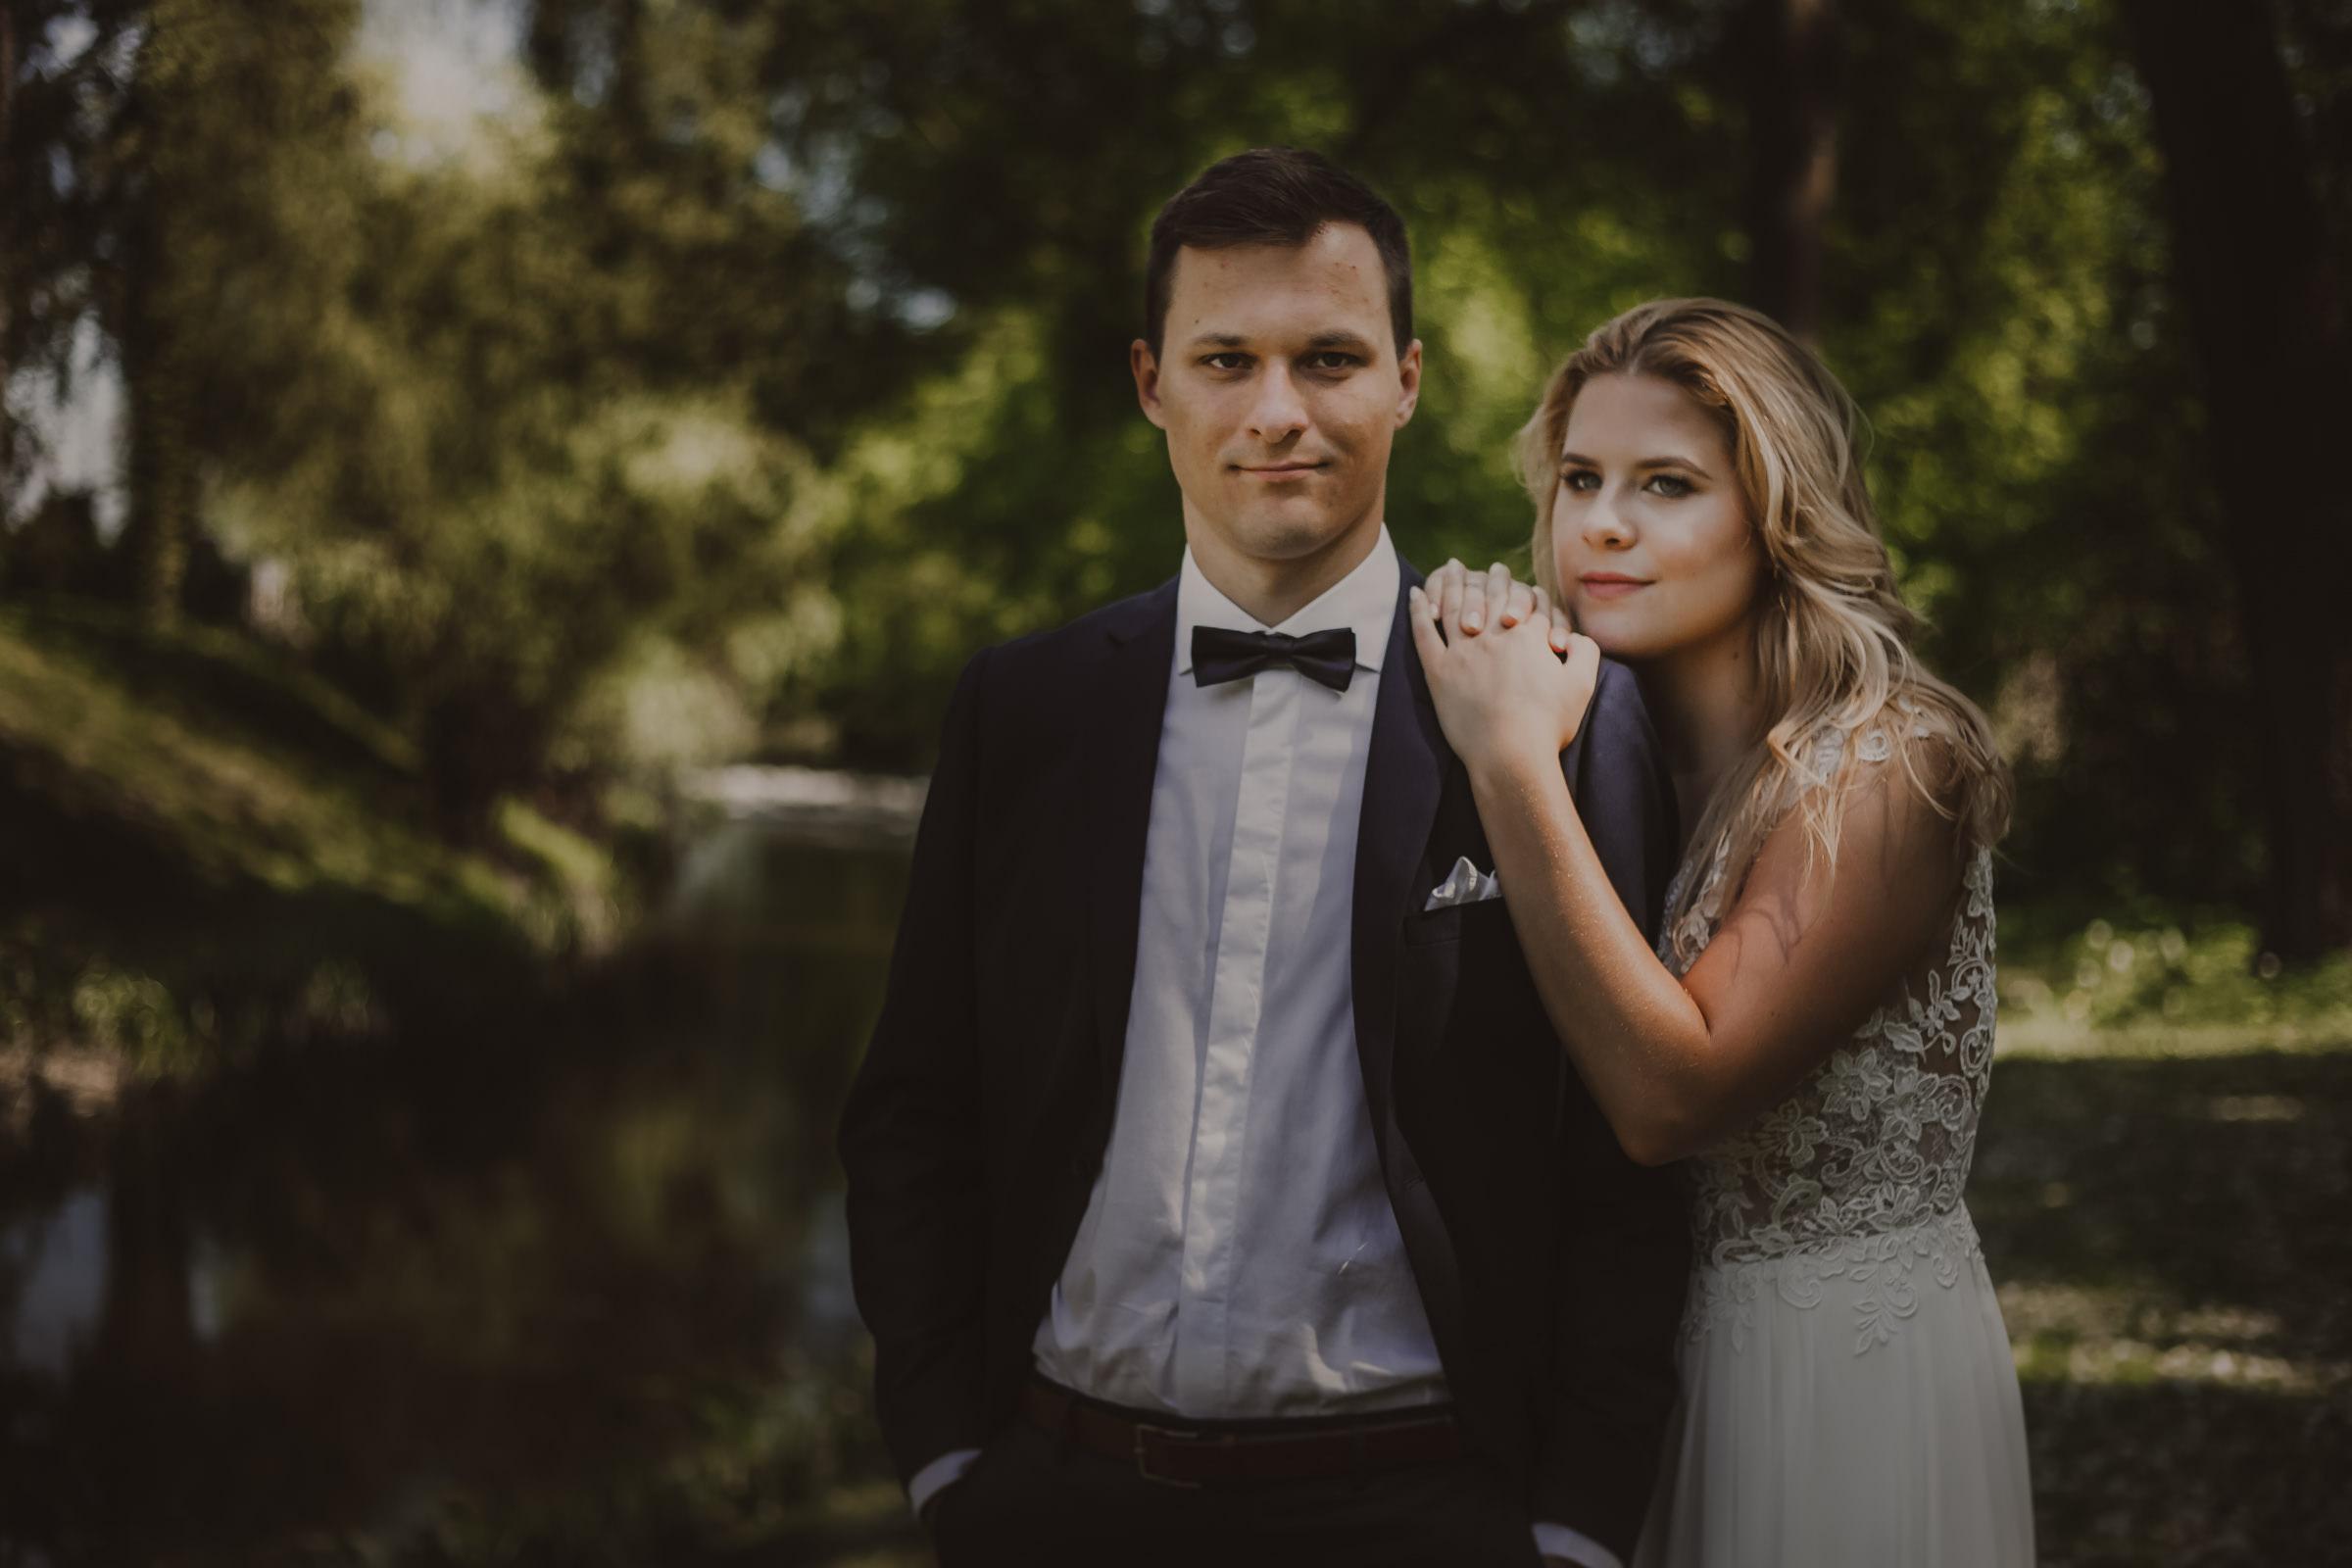 portret pary młodej